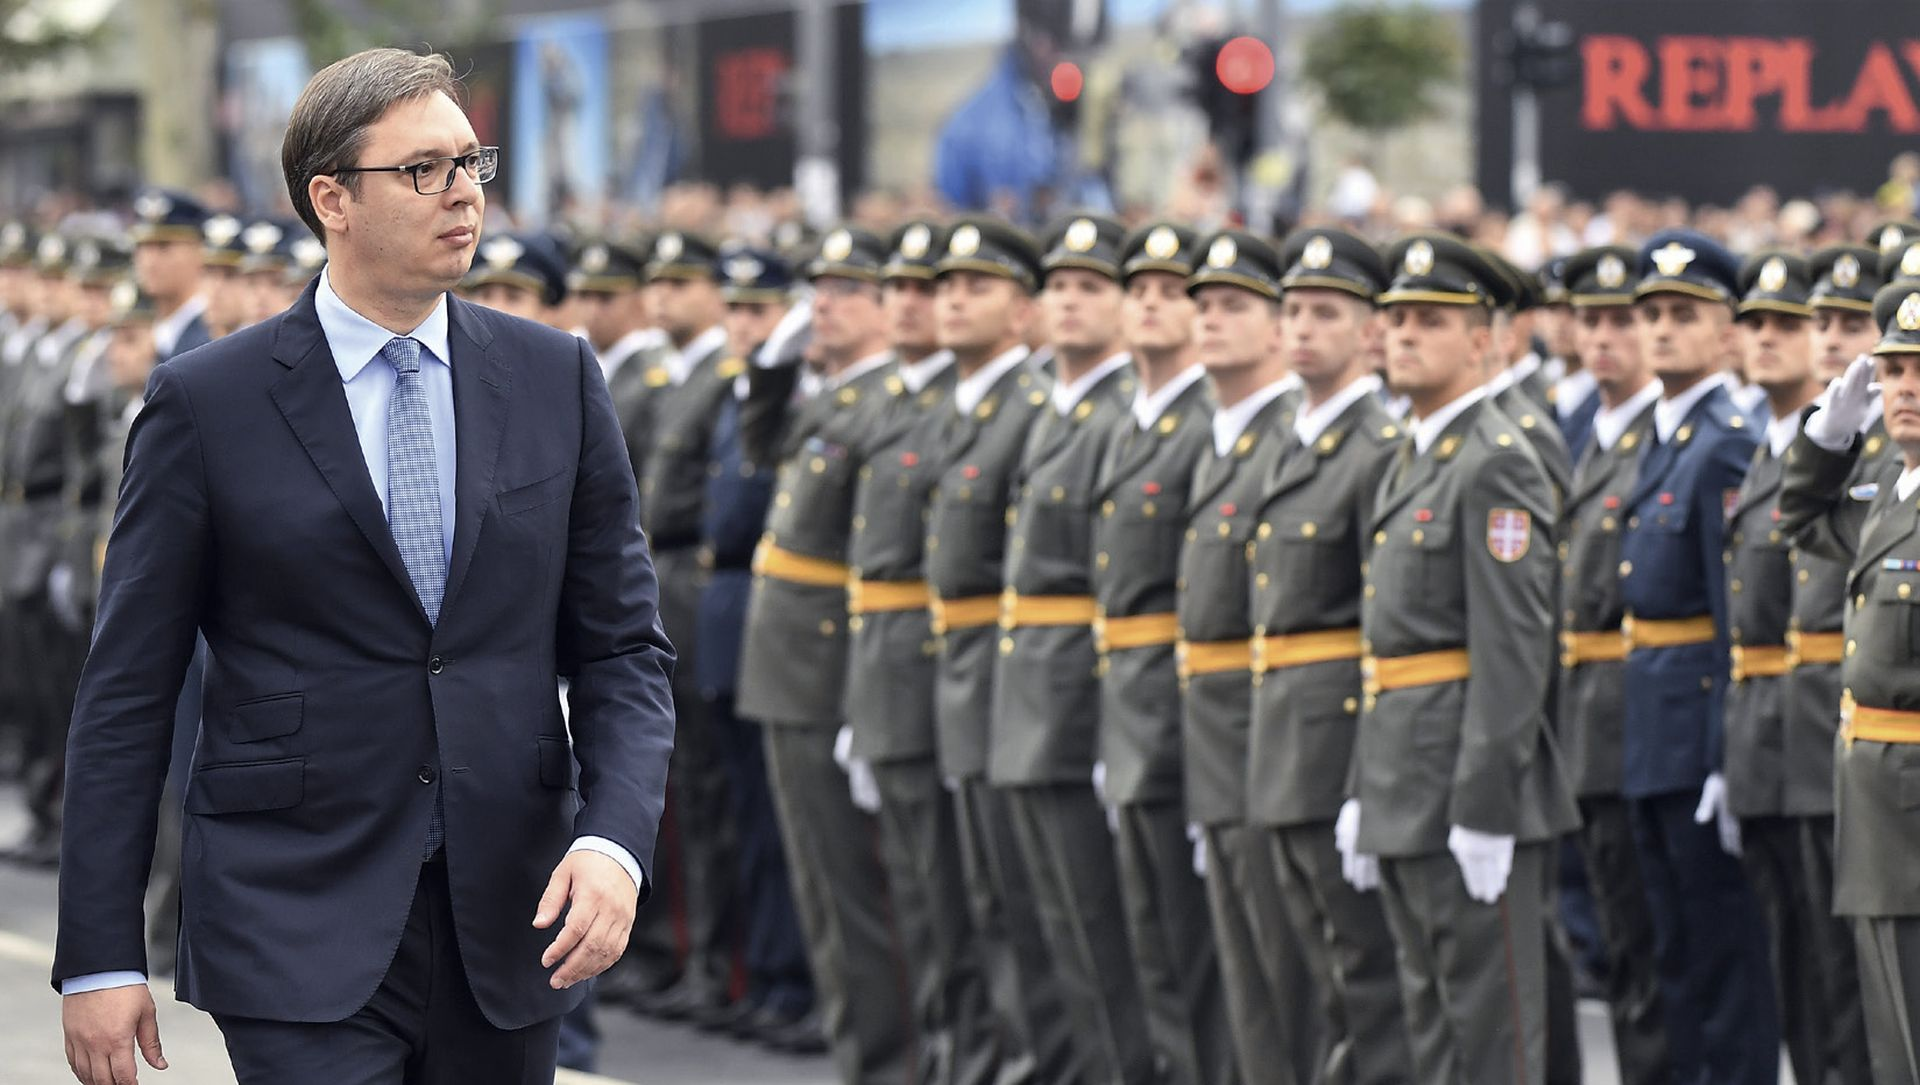 OPSESIJA TITOM Vučić militarizira zemlju i želi postati novi 'vrhovni komandant'